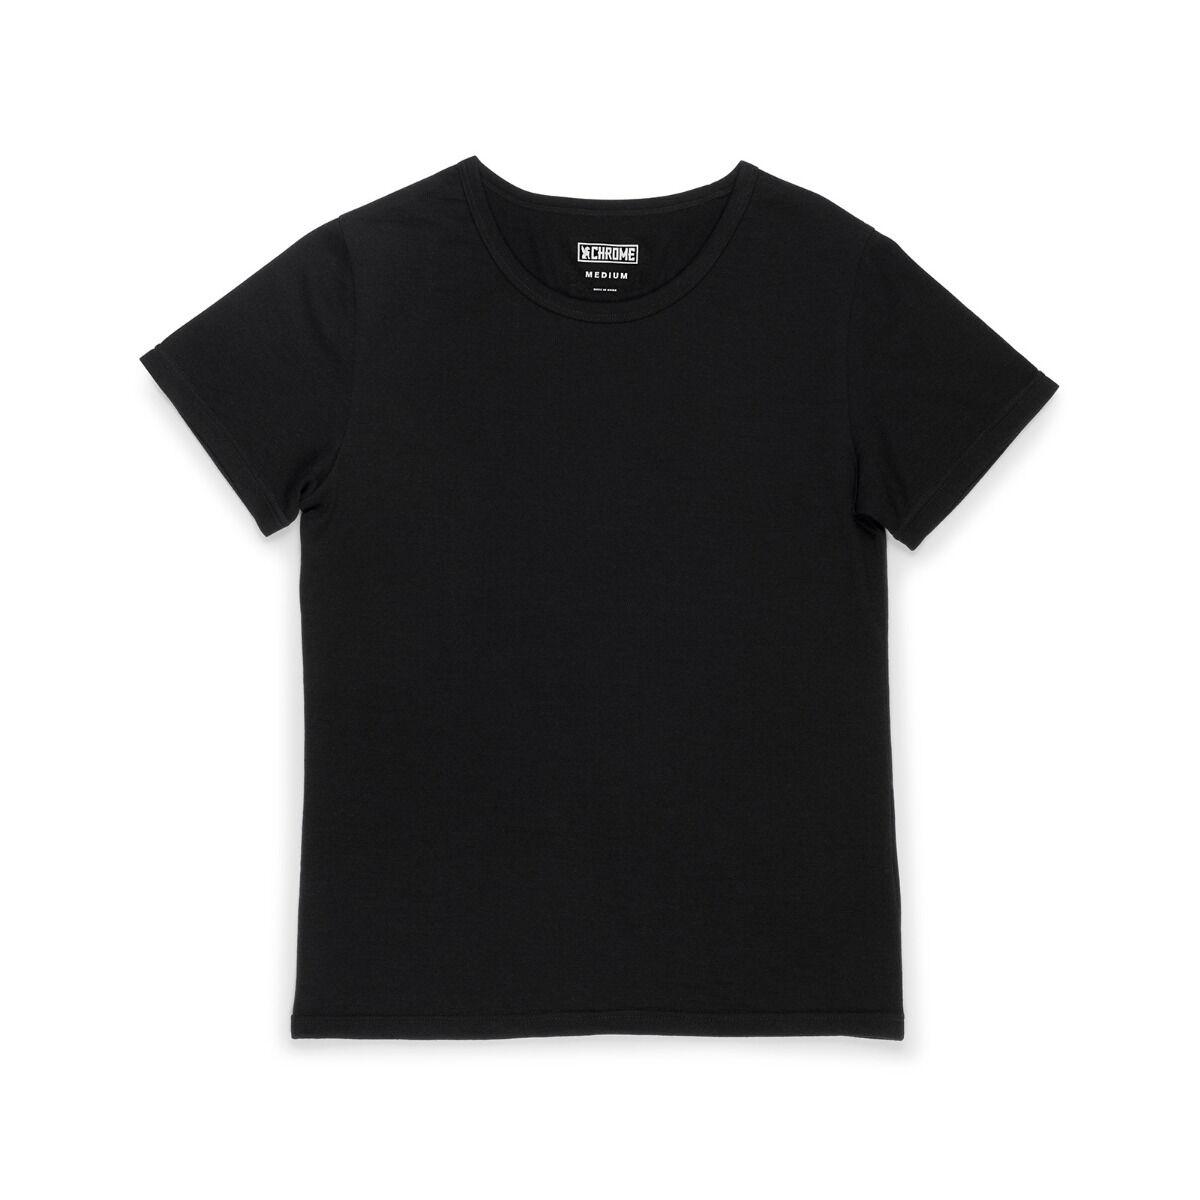 Chrome Industries Women's Merino Short Sleeve Tee-Black-L